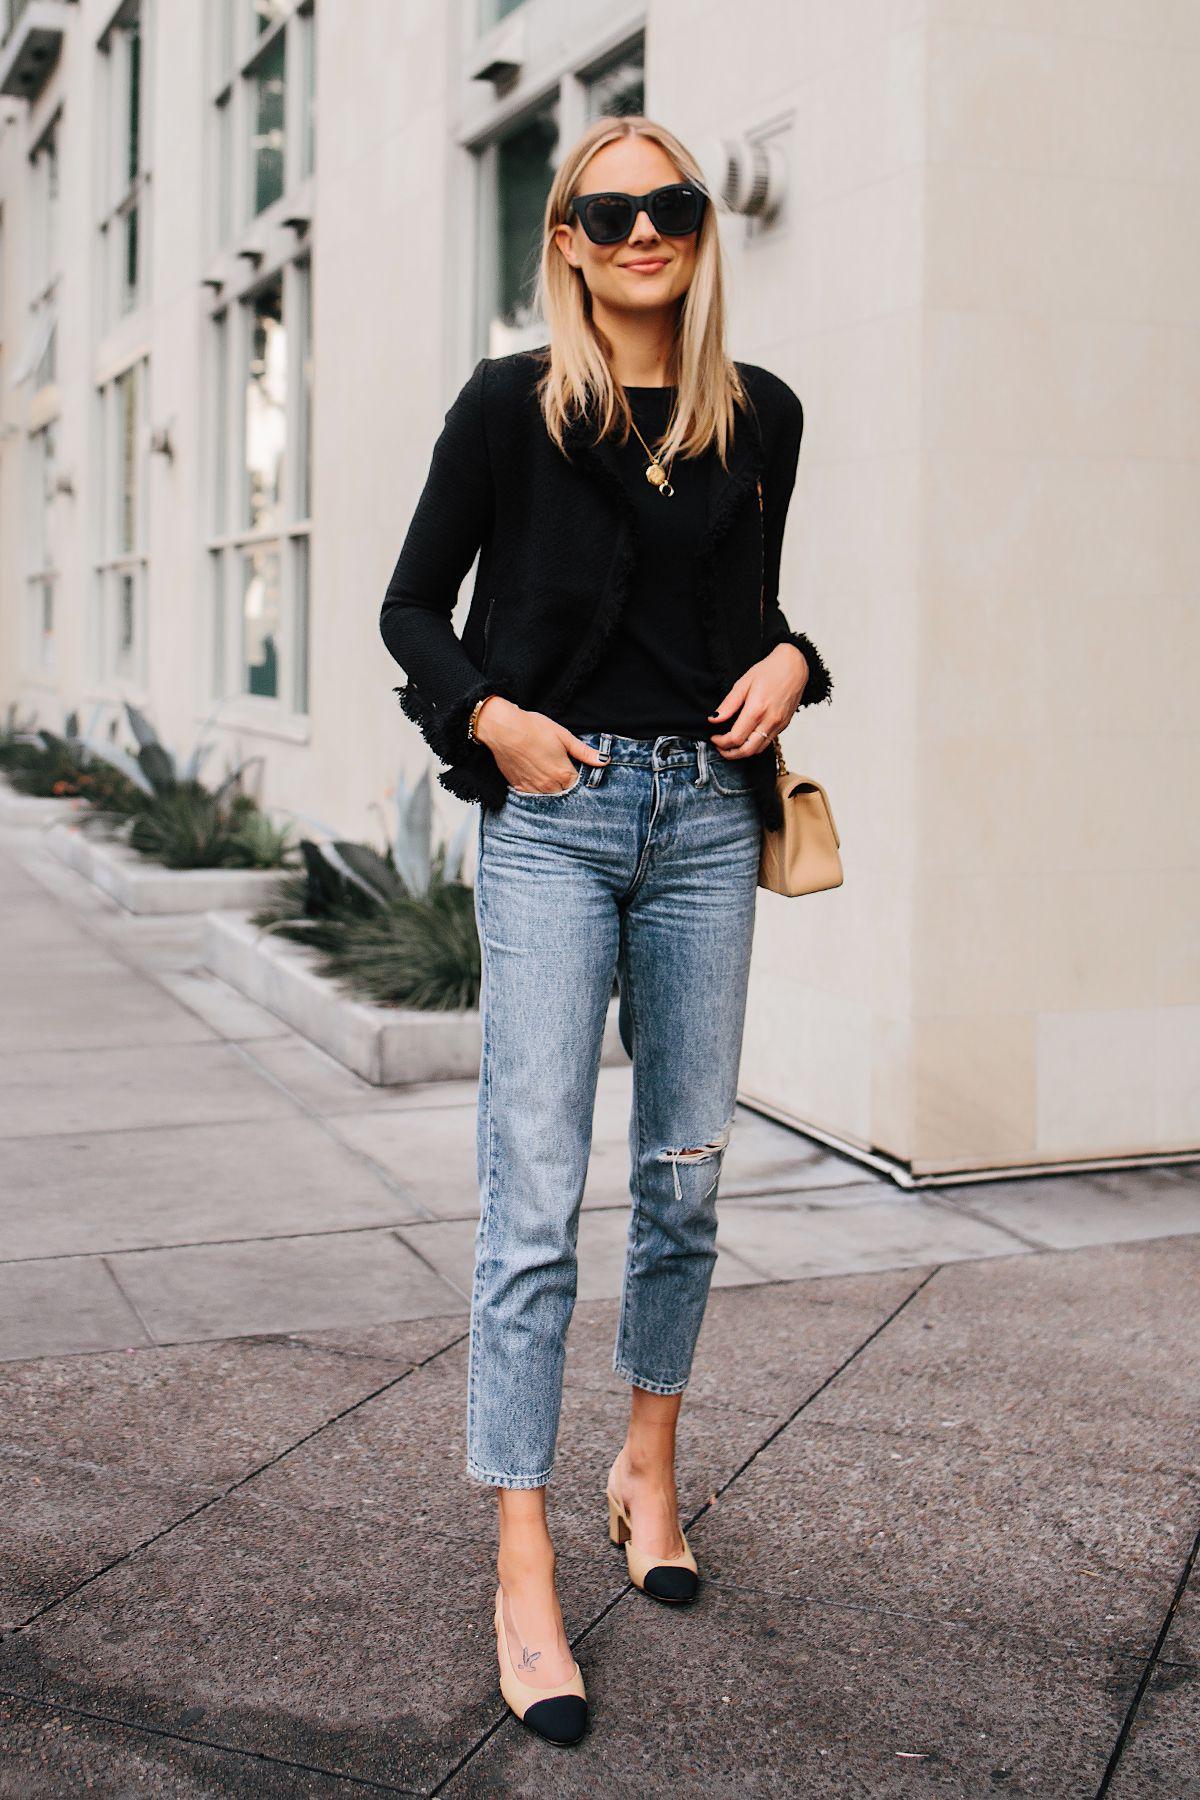 ea63096133 Blonde Woman Wearing Black Tweed Relaxed Jacket Jeans Outfit Chanel Tan  Diana Handbag Chanel Slingback Shoes Fashion Jackson San Diego Fashion  Blogger ...